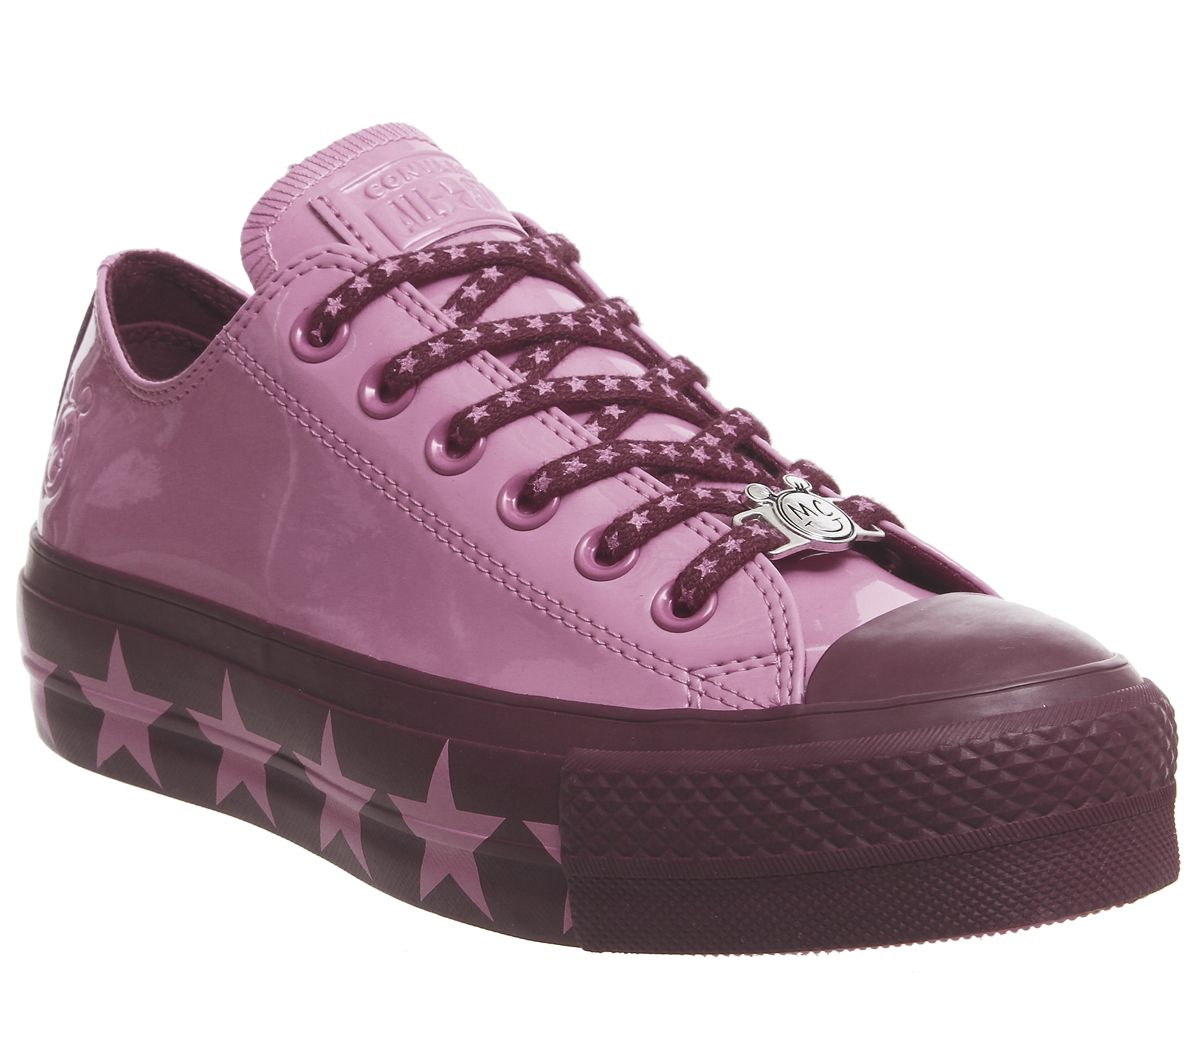 b355b216269d Converse Ctas Lift Ox Trainers Pink Dark Burgundy Pink X Mc - Hers ...